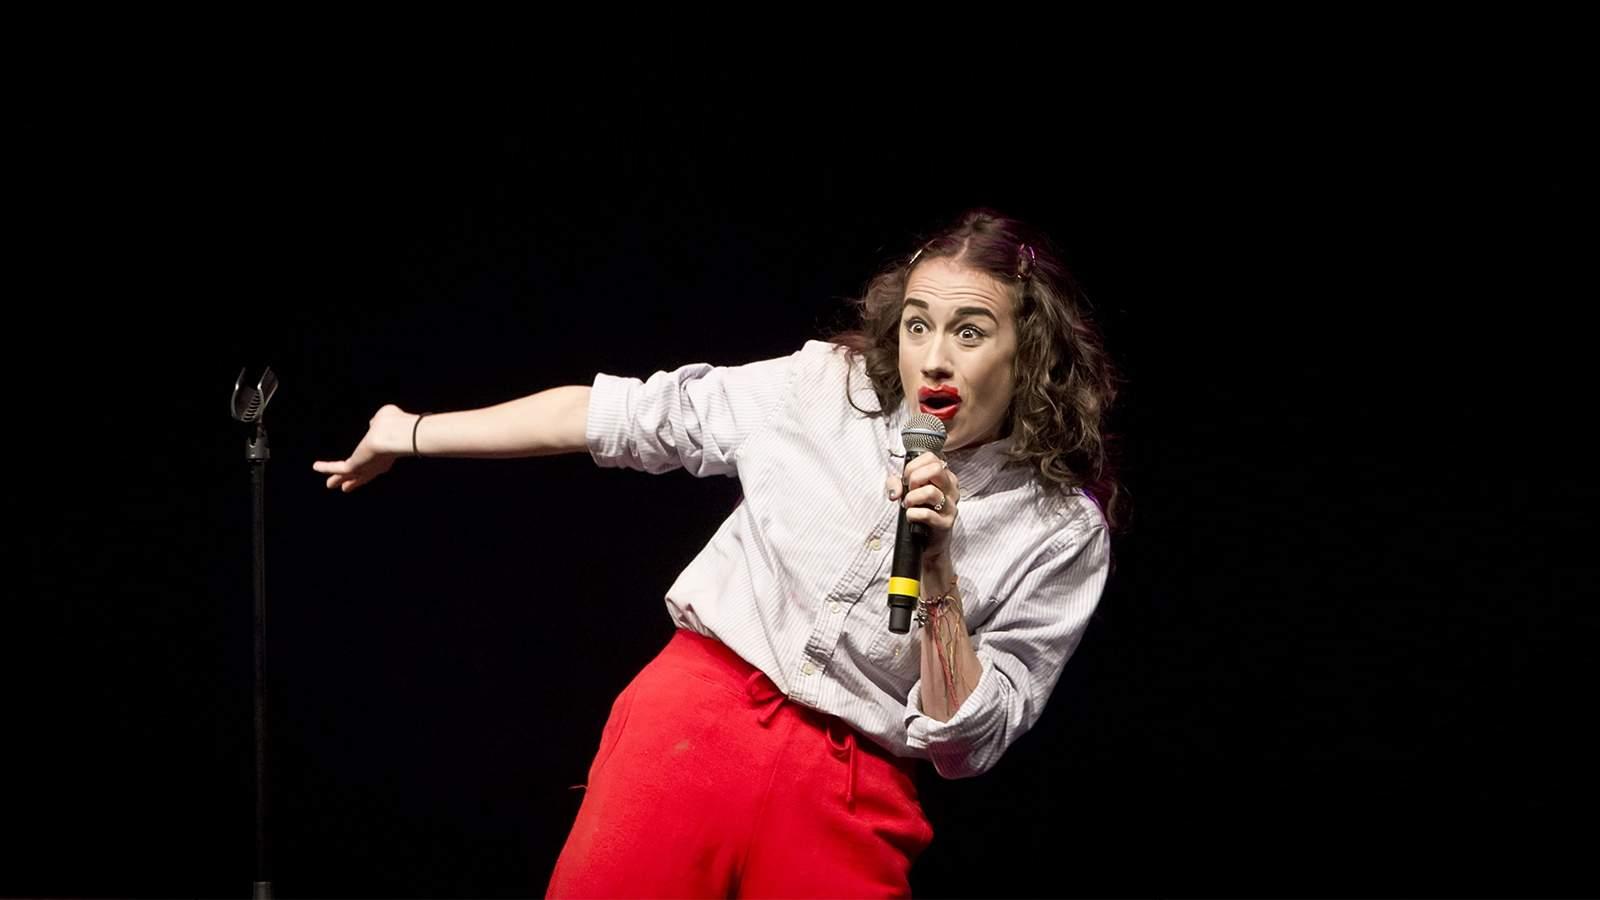 Miranda Sings (Rescheduled from 3/21/2020, 8/28/2020, 4/9/2021)